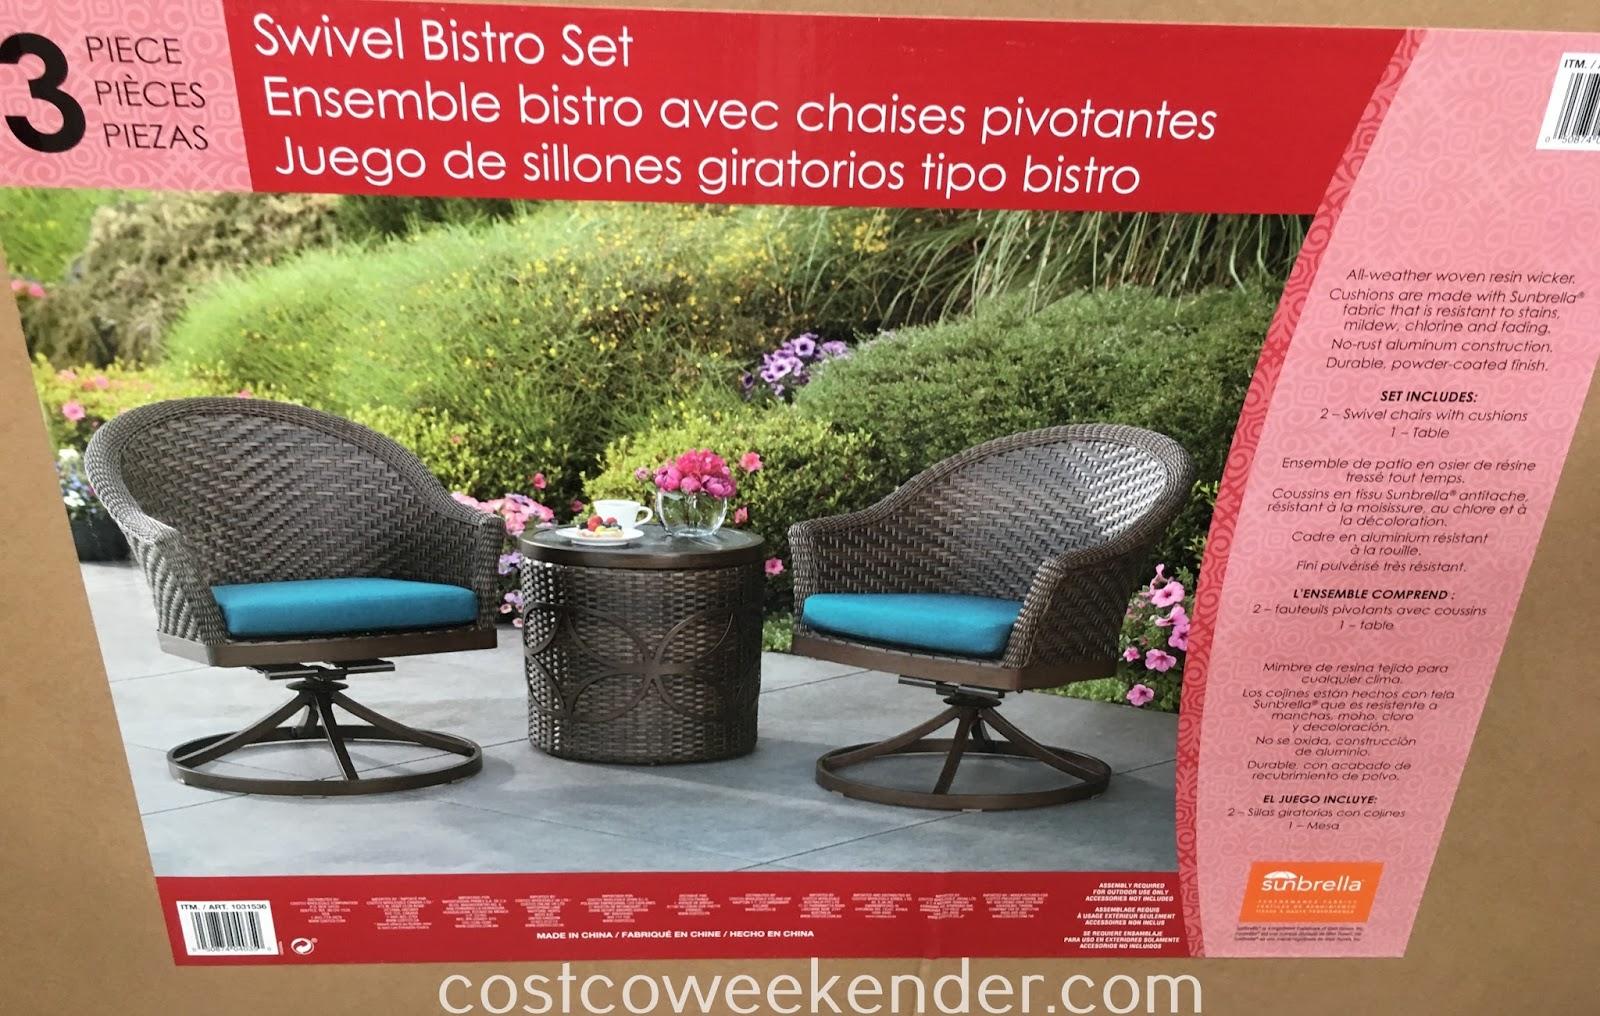 Strange Agio International 3 Piece Swivel Bistro Set Costco Weekender Ibusinesslaw Wood Chair Design Ideas Ibusinesslaworg